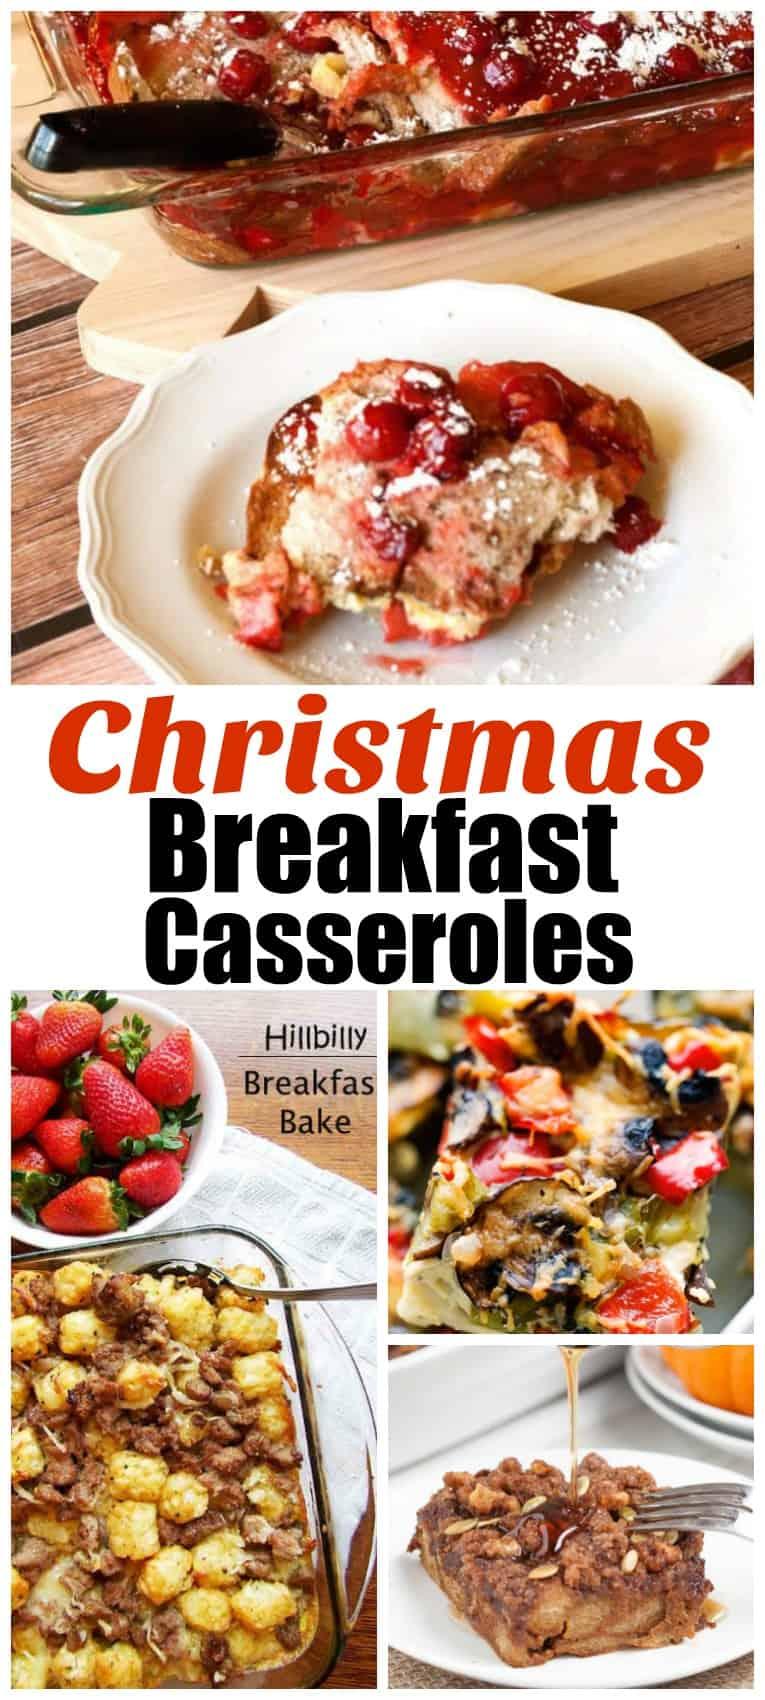 Best Christmas Breakfast Casserole Recipes